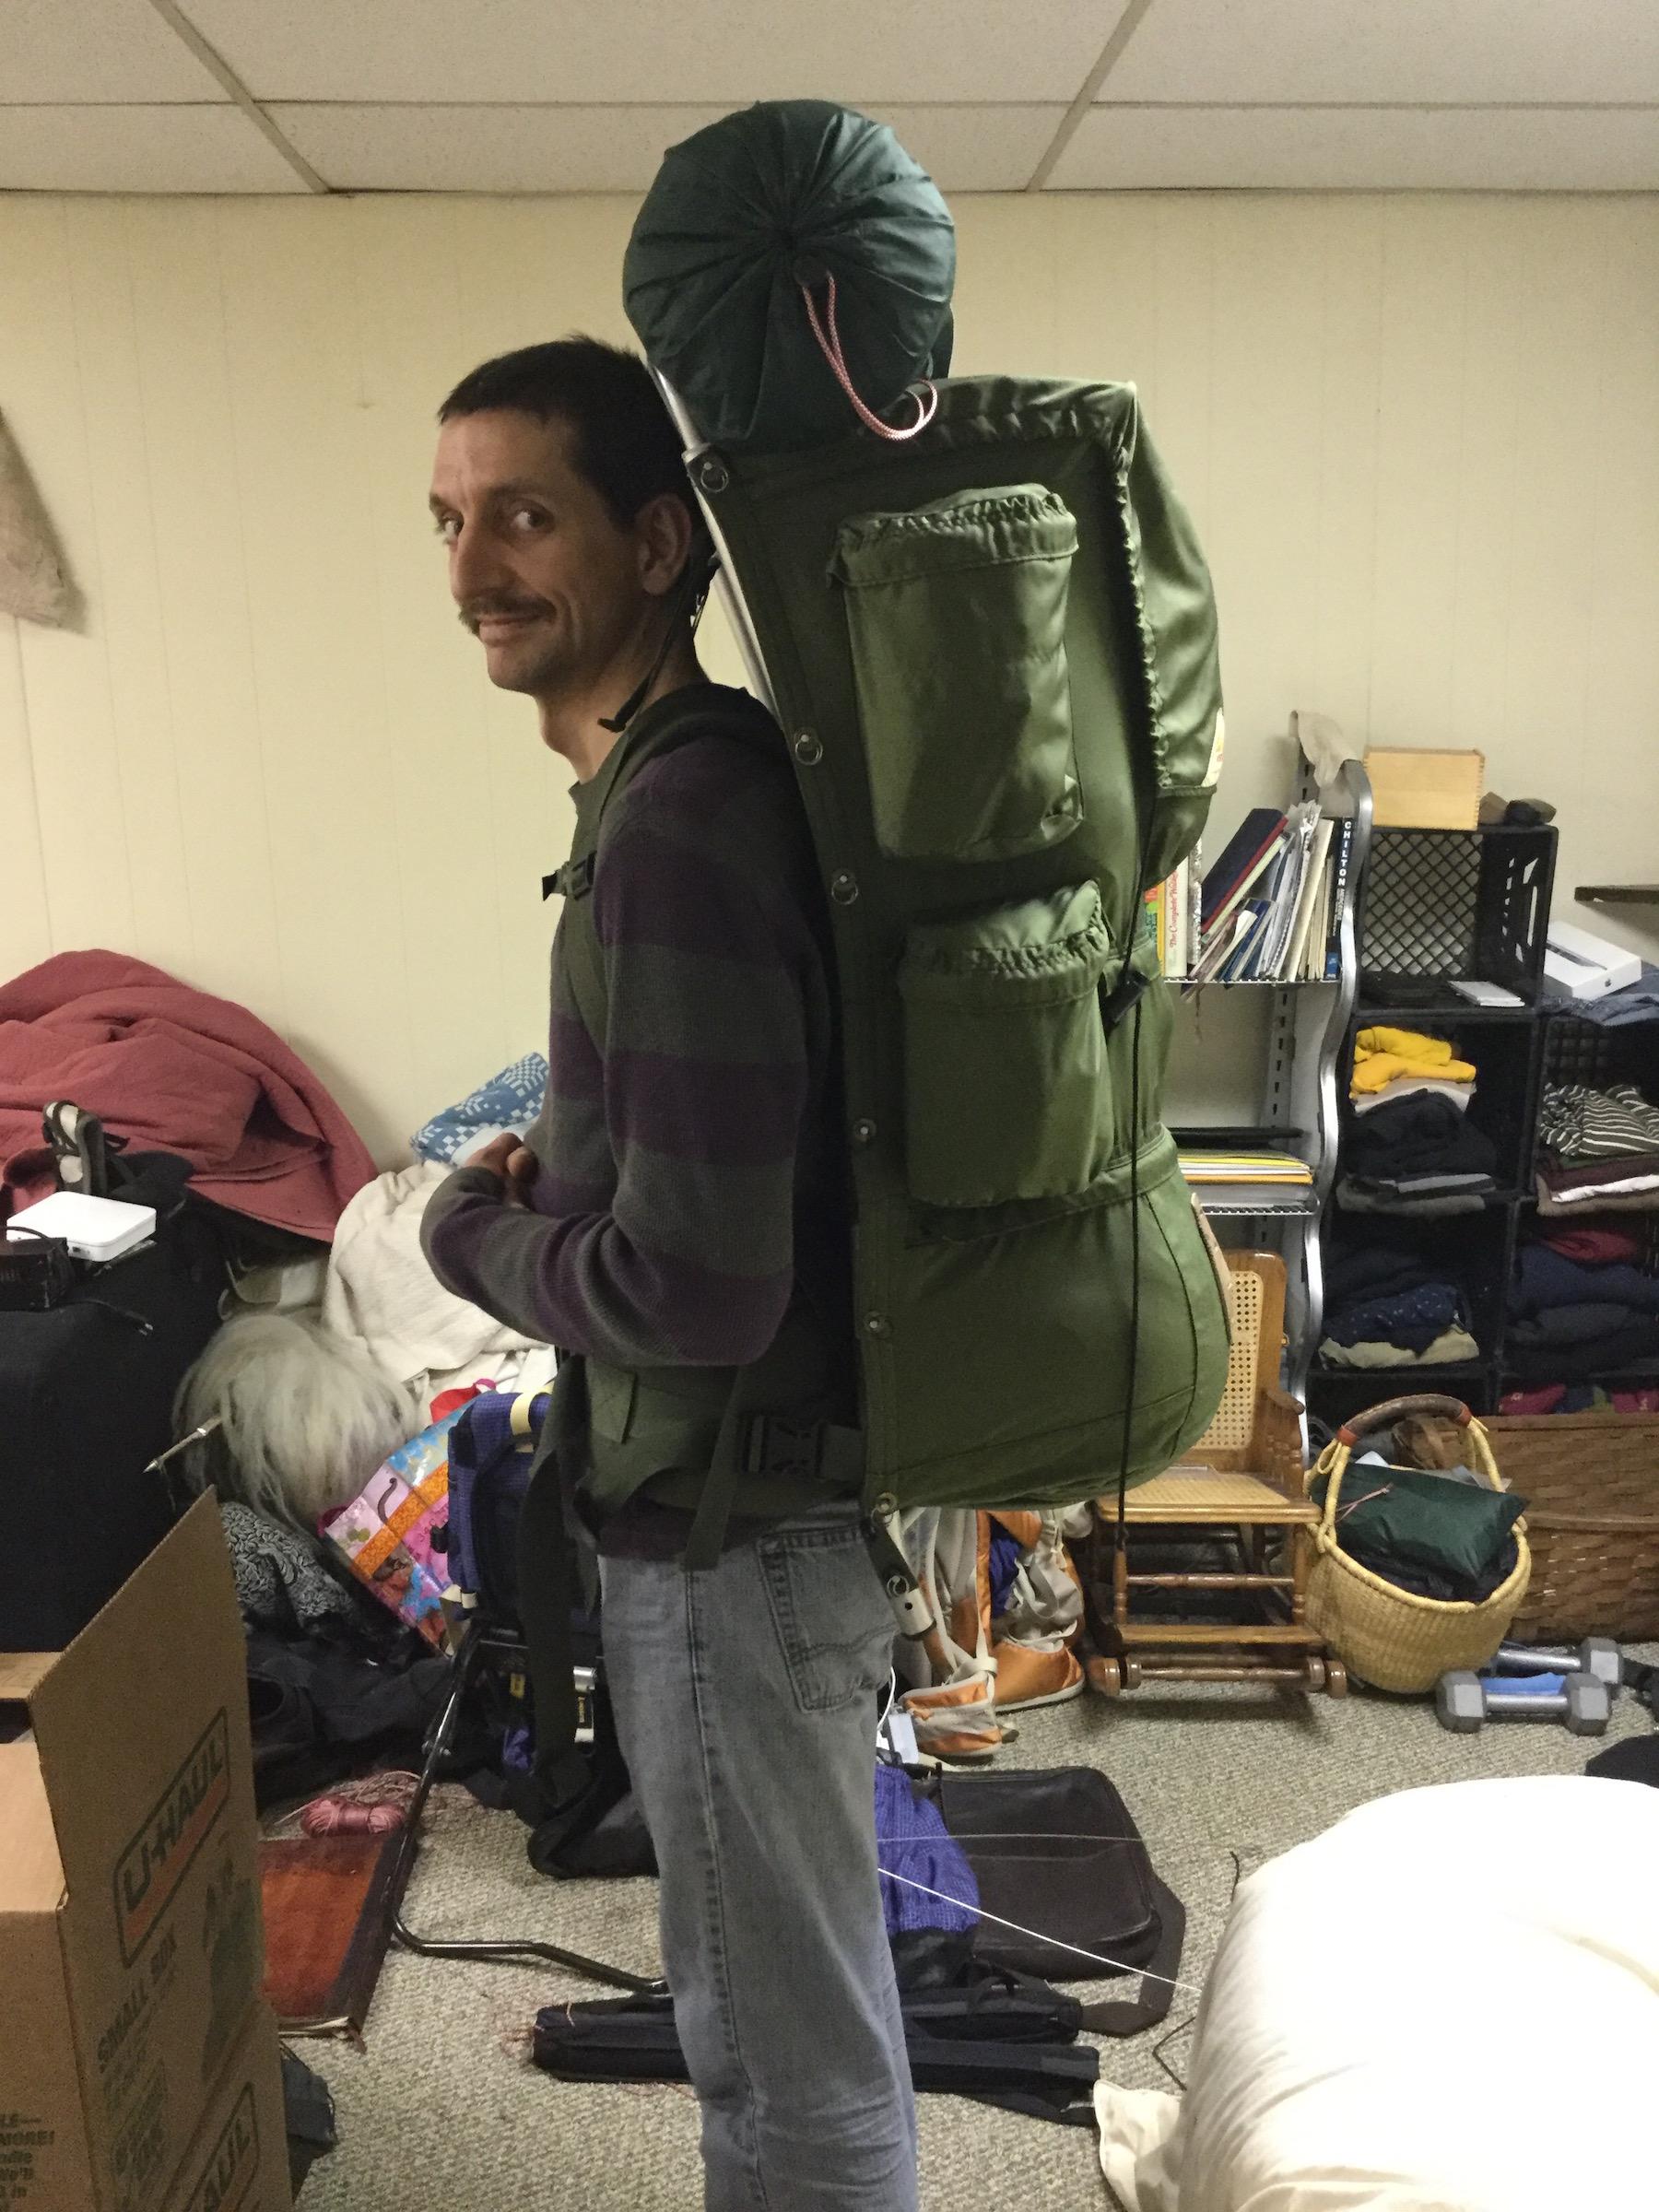 the kelty external frame backpack thread backpacking light - External Frame Backpacks